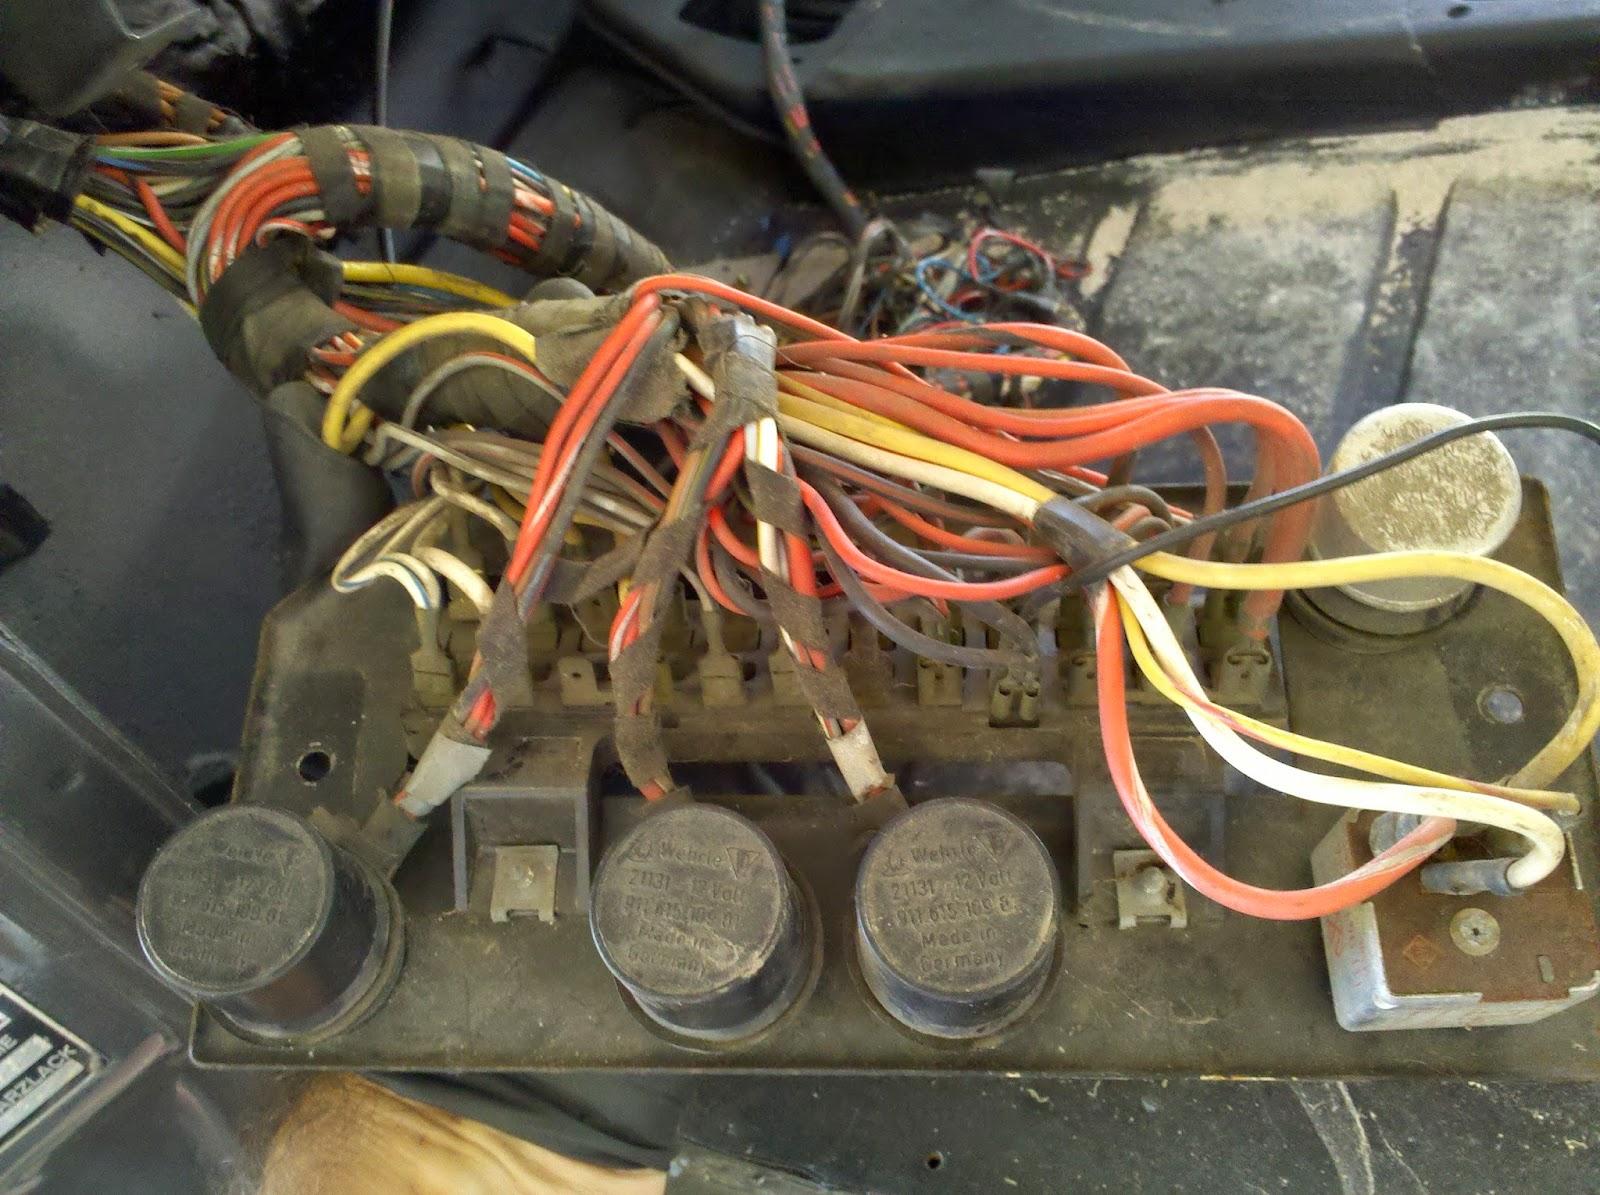 Porsche 914 Wiring Loom Manual Guide Diagram Engine 914e Electric Conversion And Tesla Obsession Fuse Block Rh Porsche914e Blogspot Com Harness